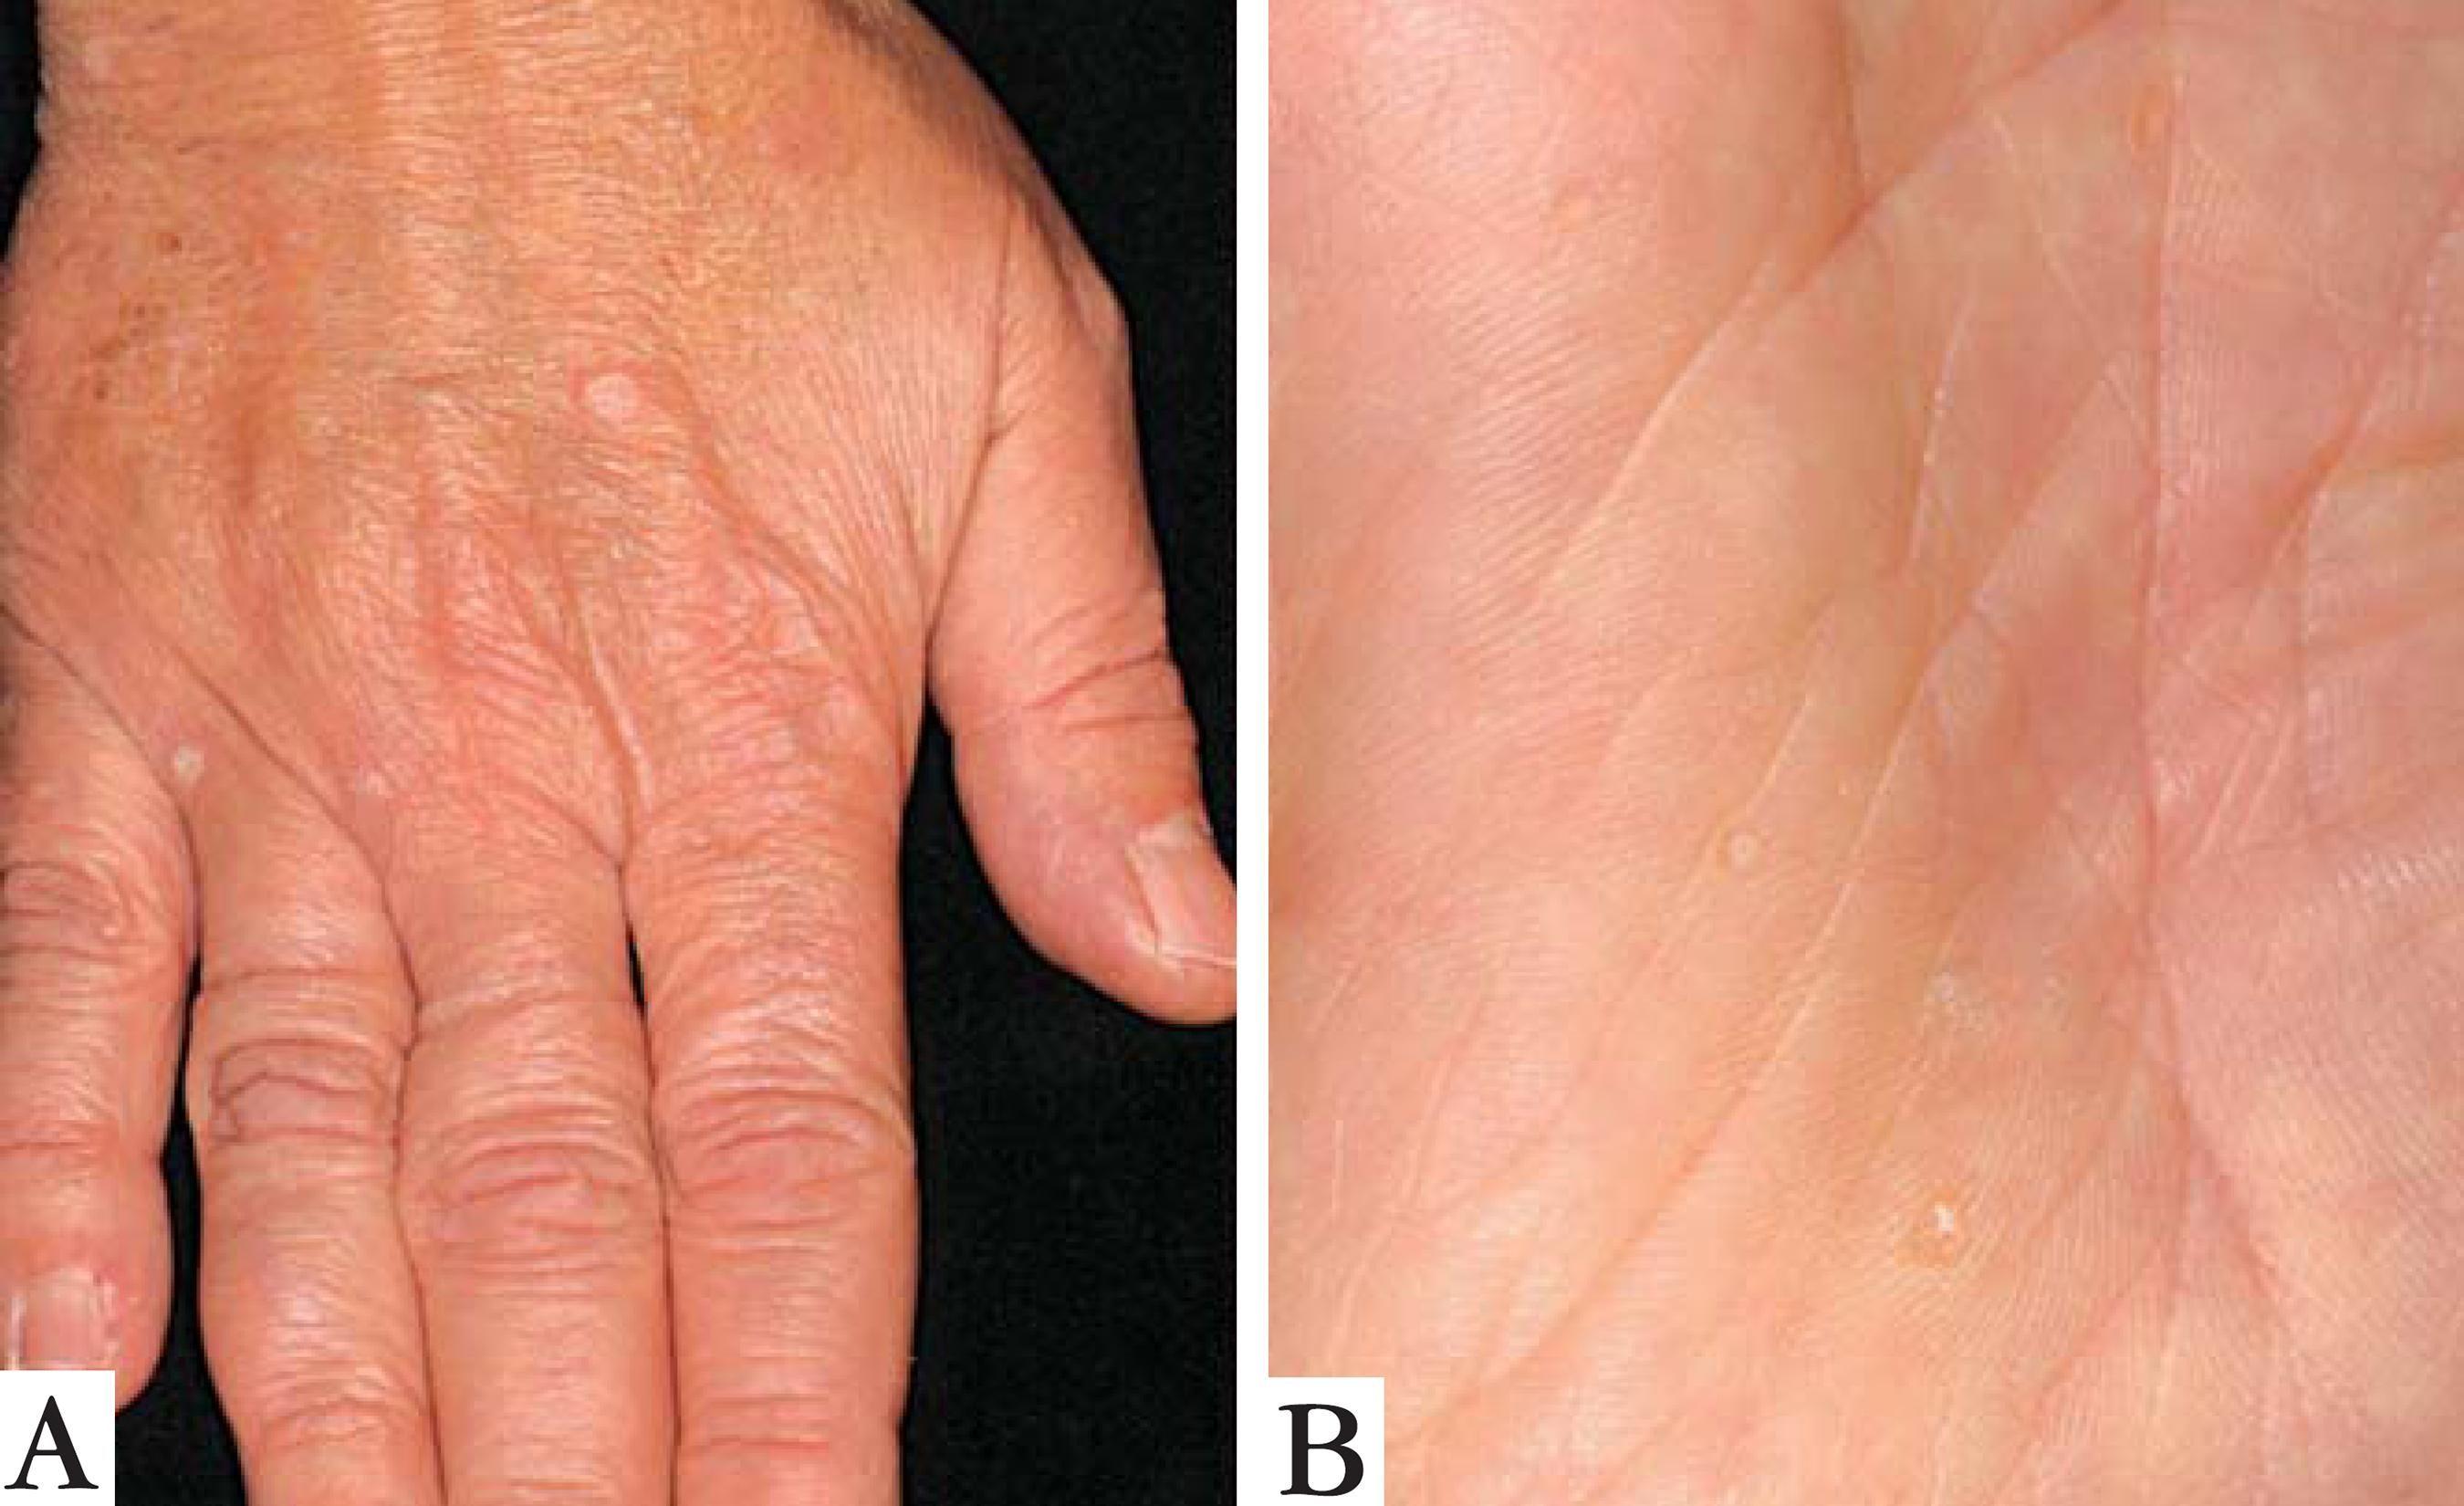 Seborrheic Keratosis Causes Wart Like Skin Growths ...